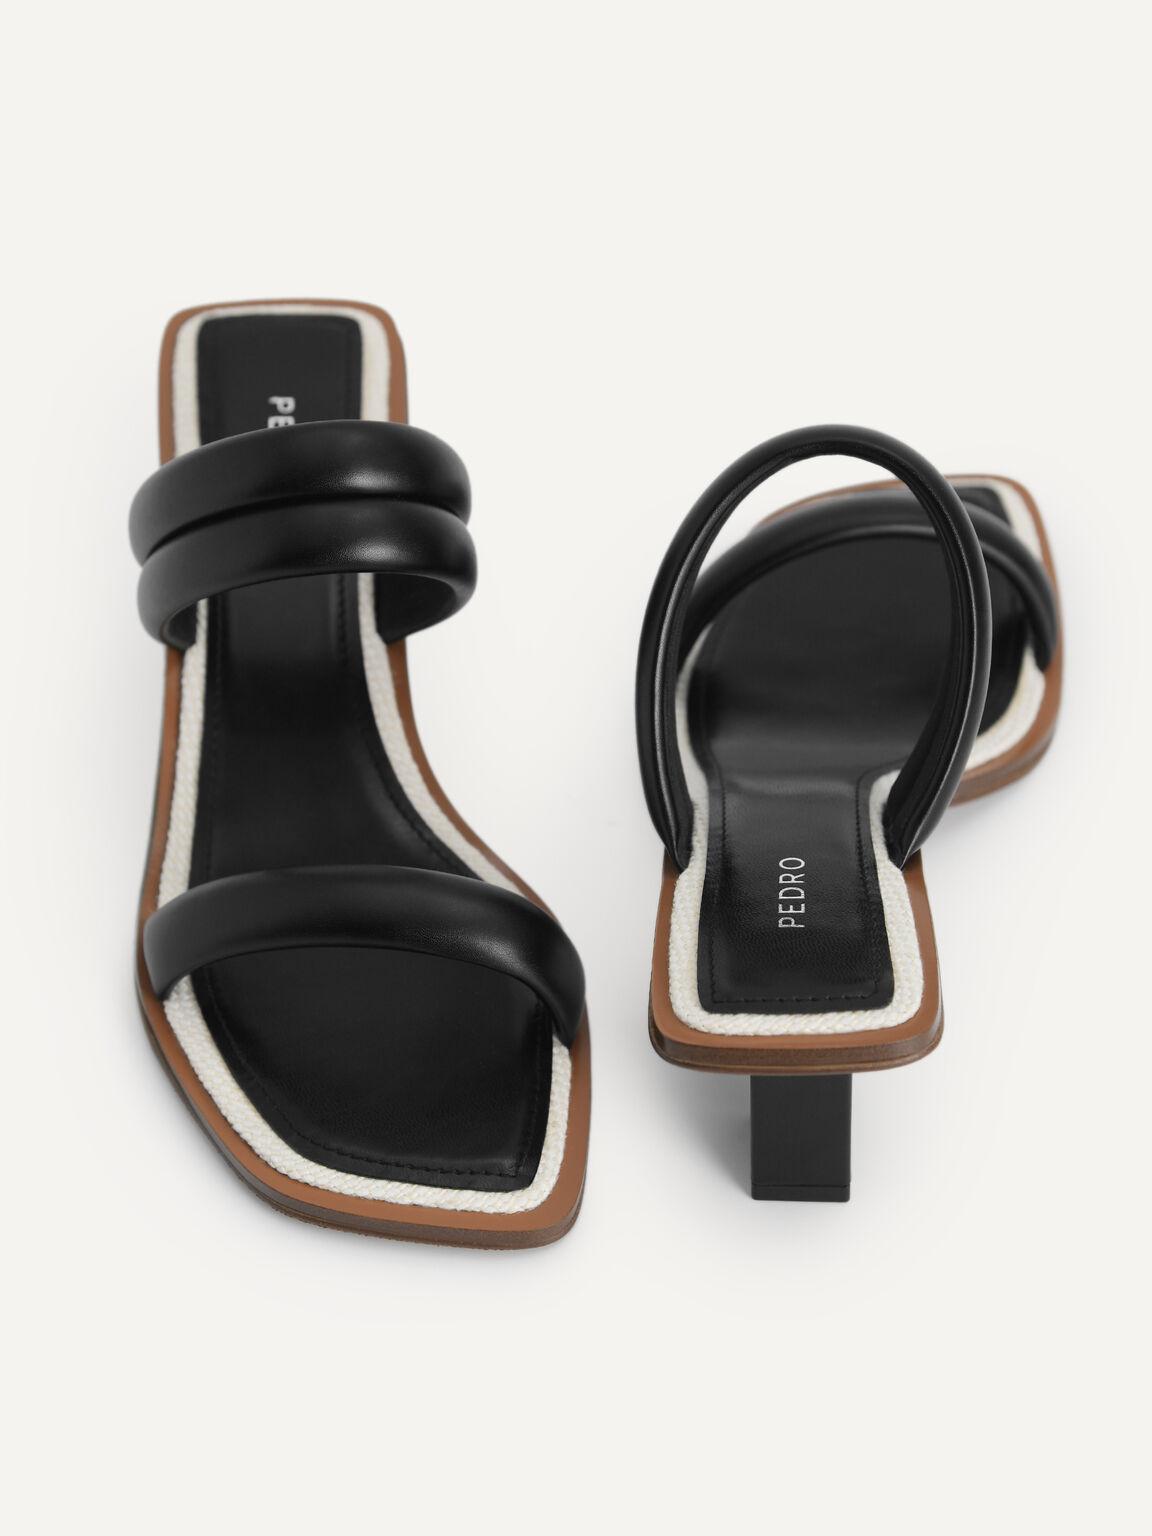 Double Strap Heeled Sandals, Black, hi-res